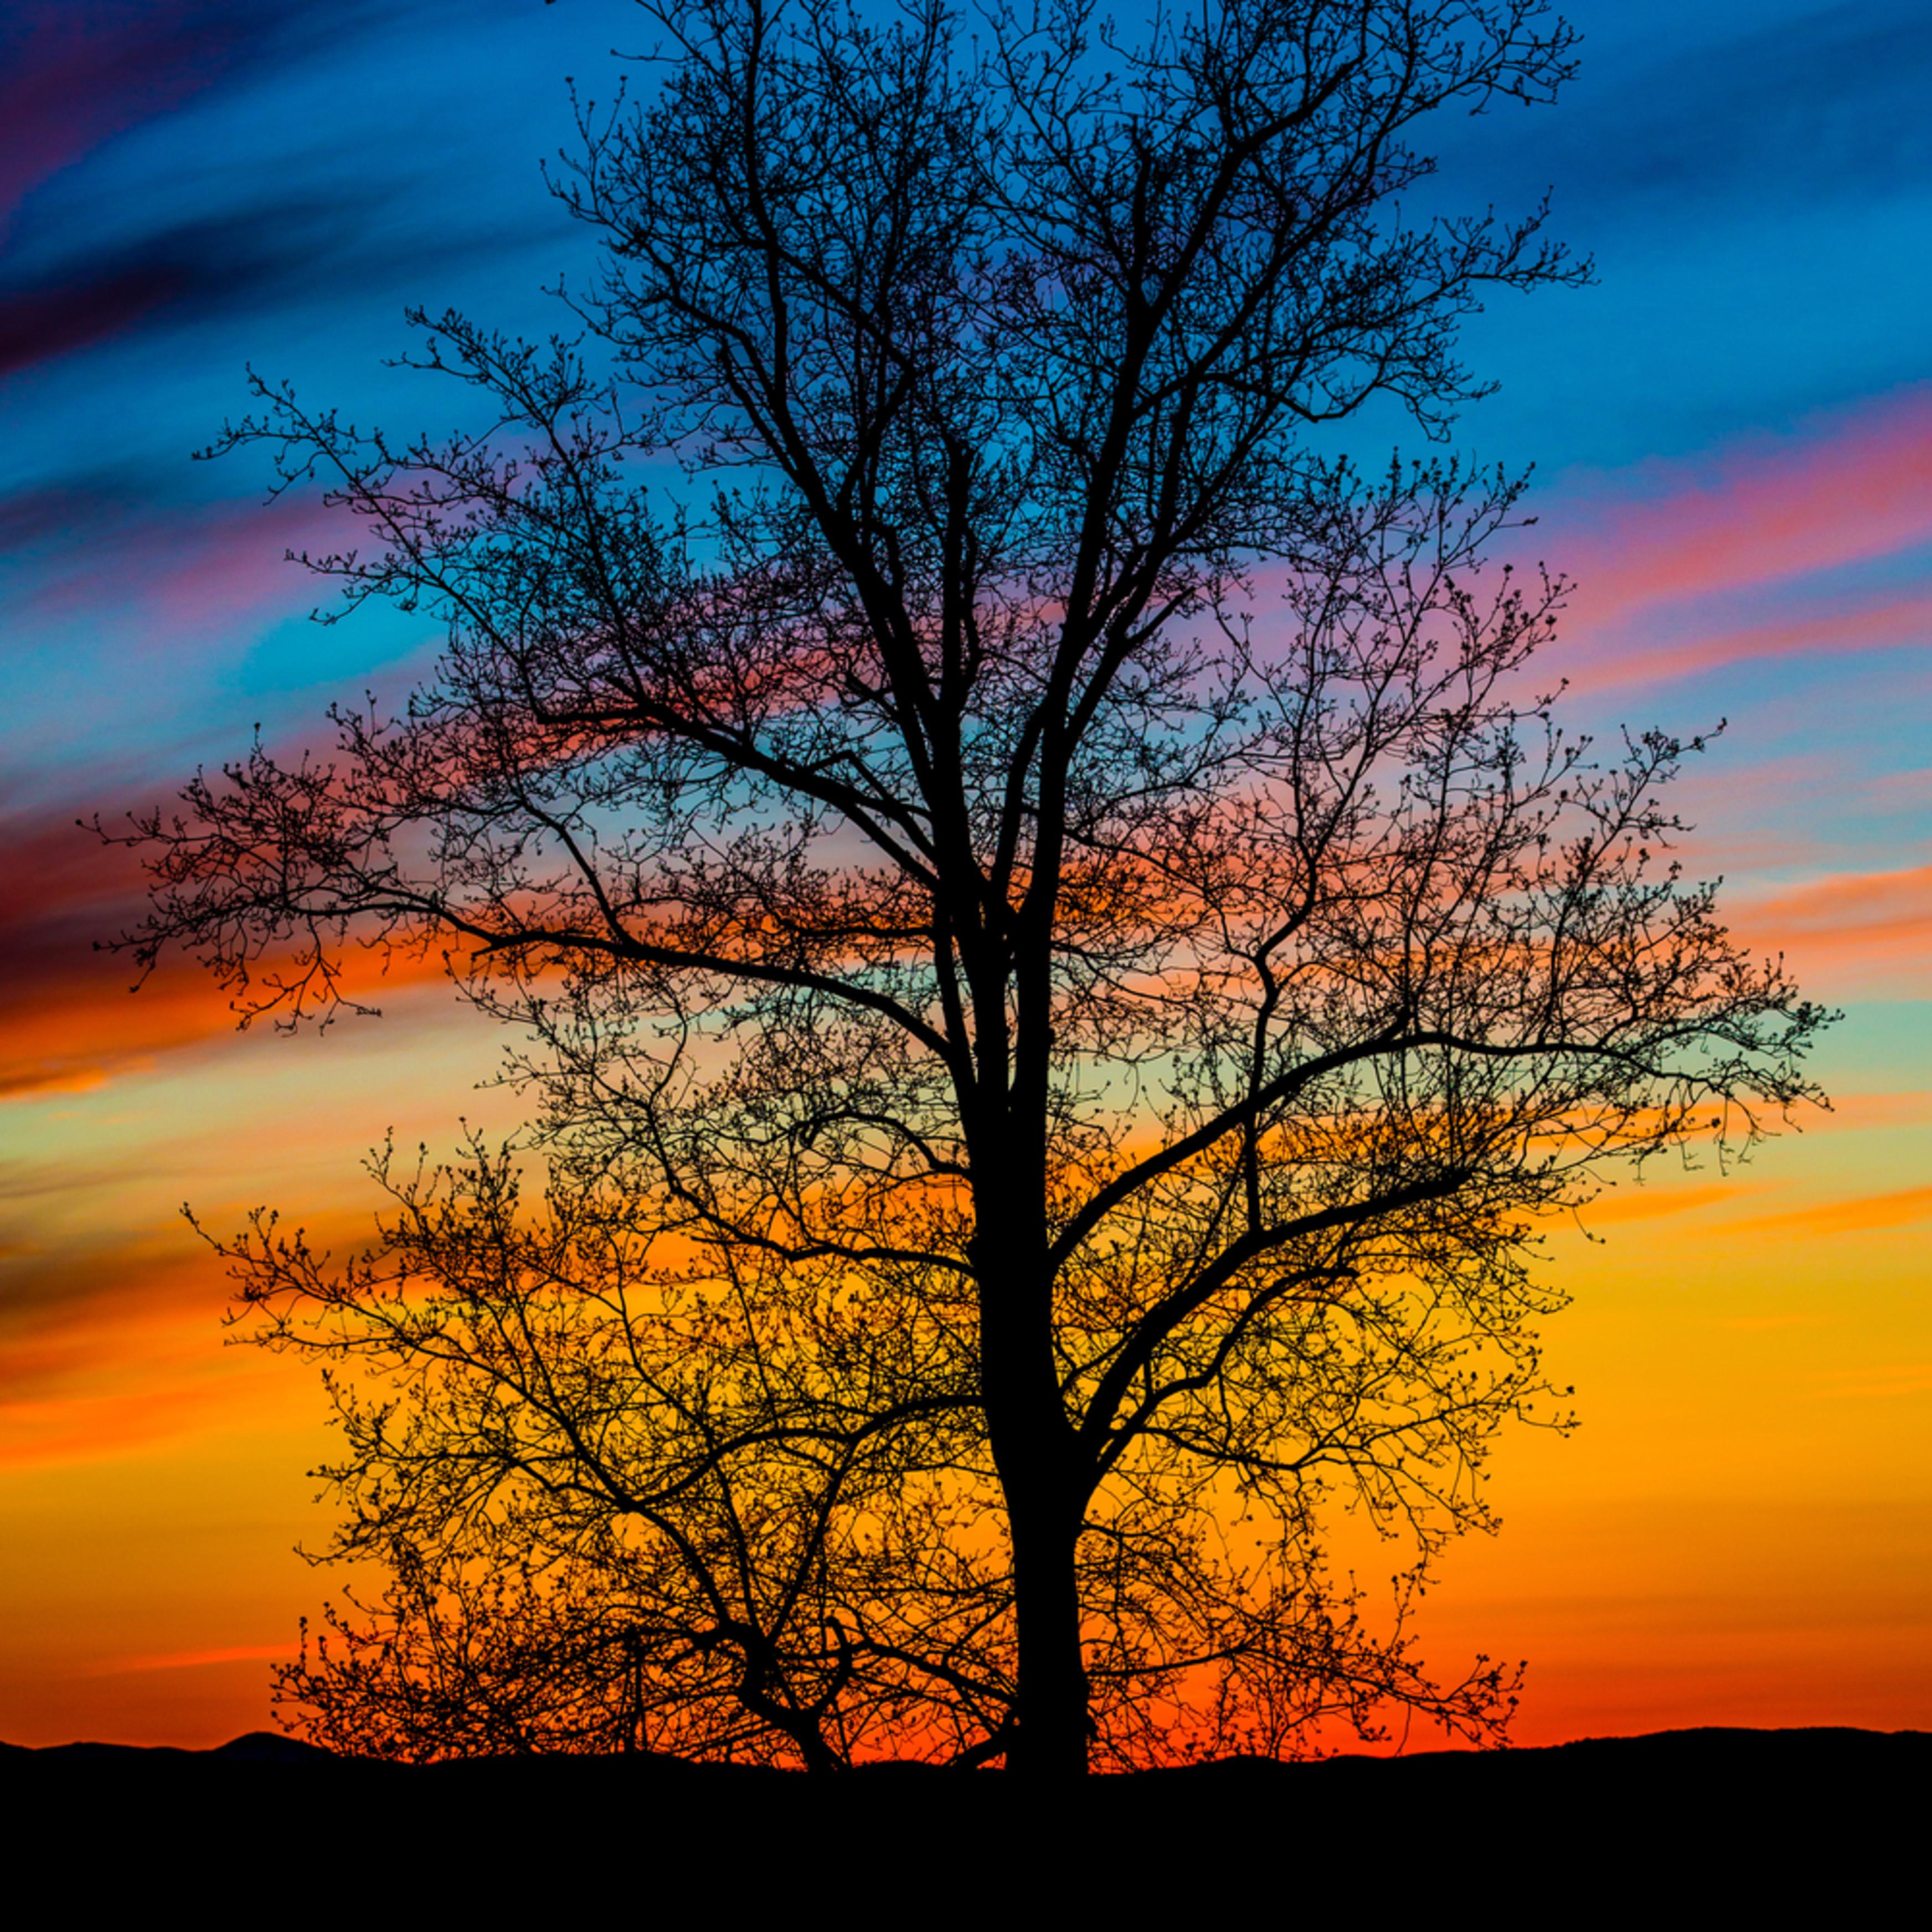 Sunset silhouette i ap8hym